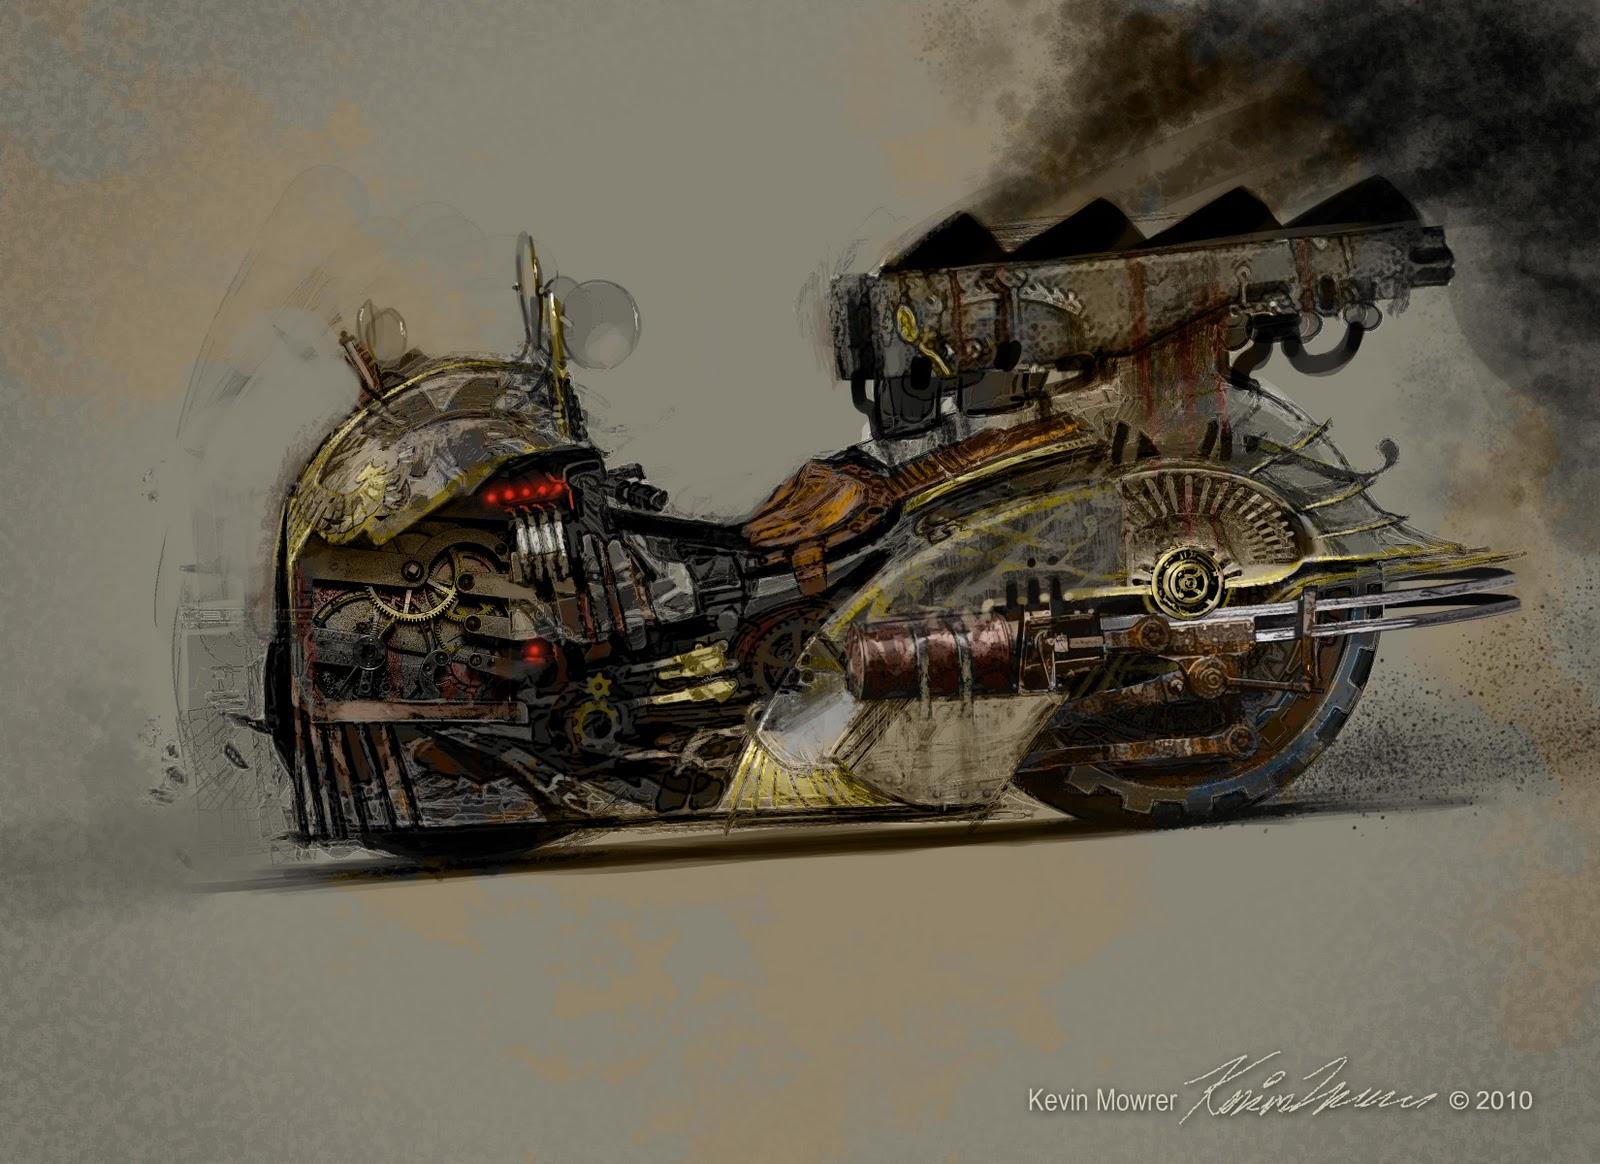 Idées : Moto Steampunk Steampunk+motorcycle+contraption